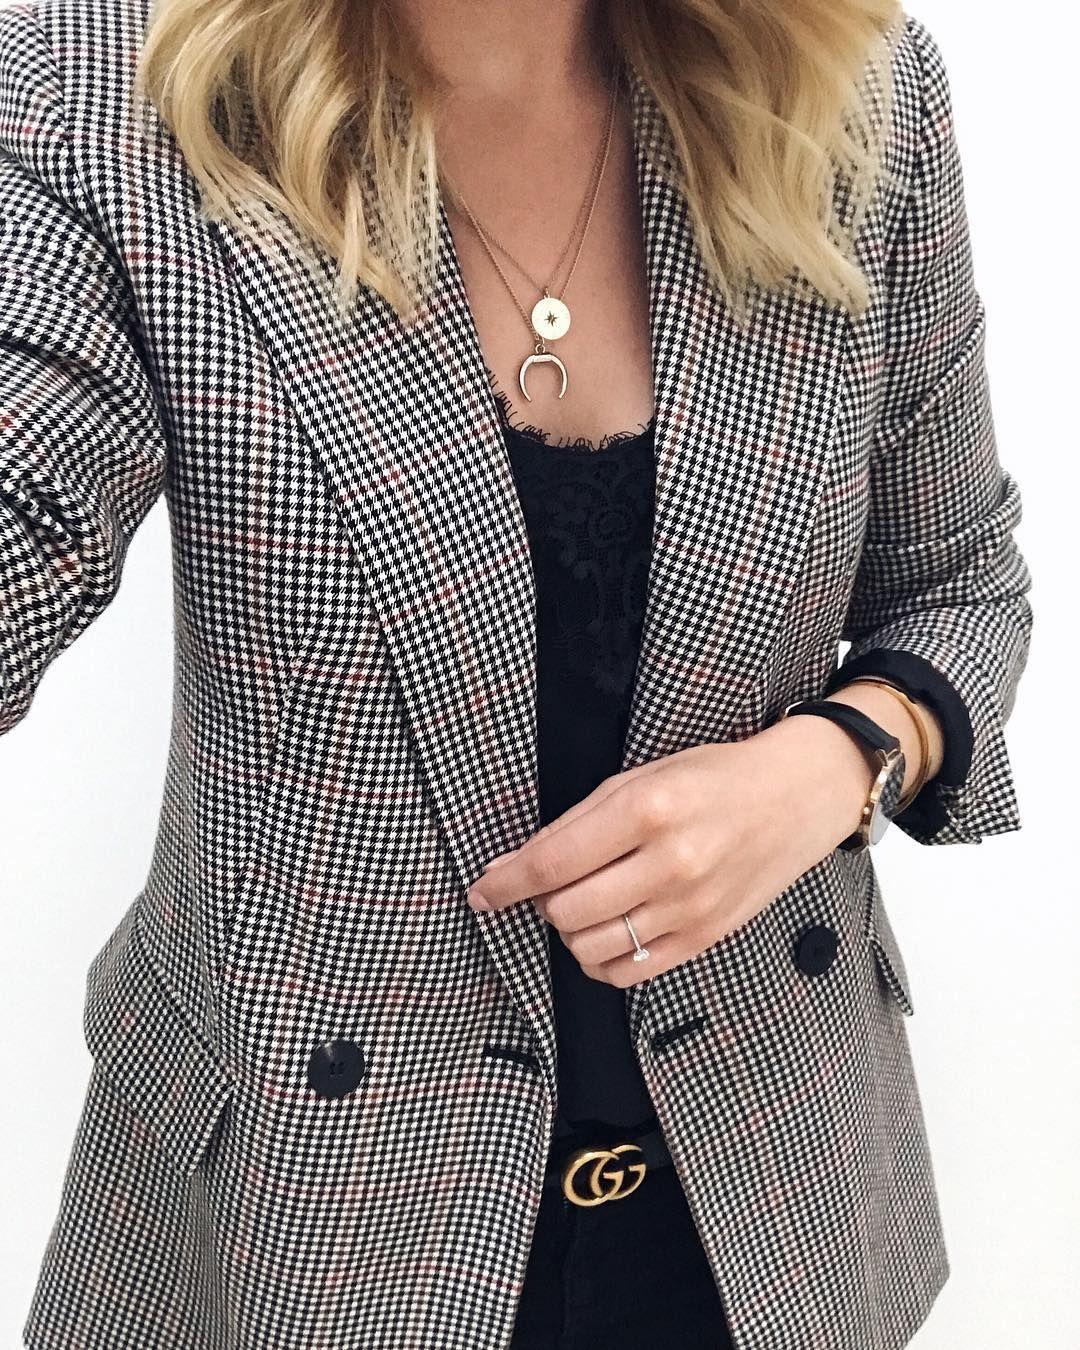 Key Piece on this rainy Monday: my new checked blazer from Mango. I love it!